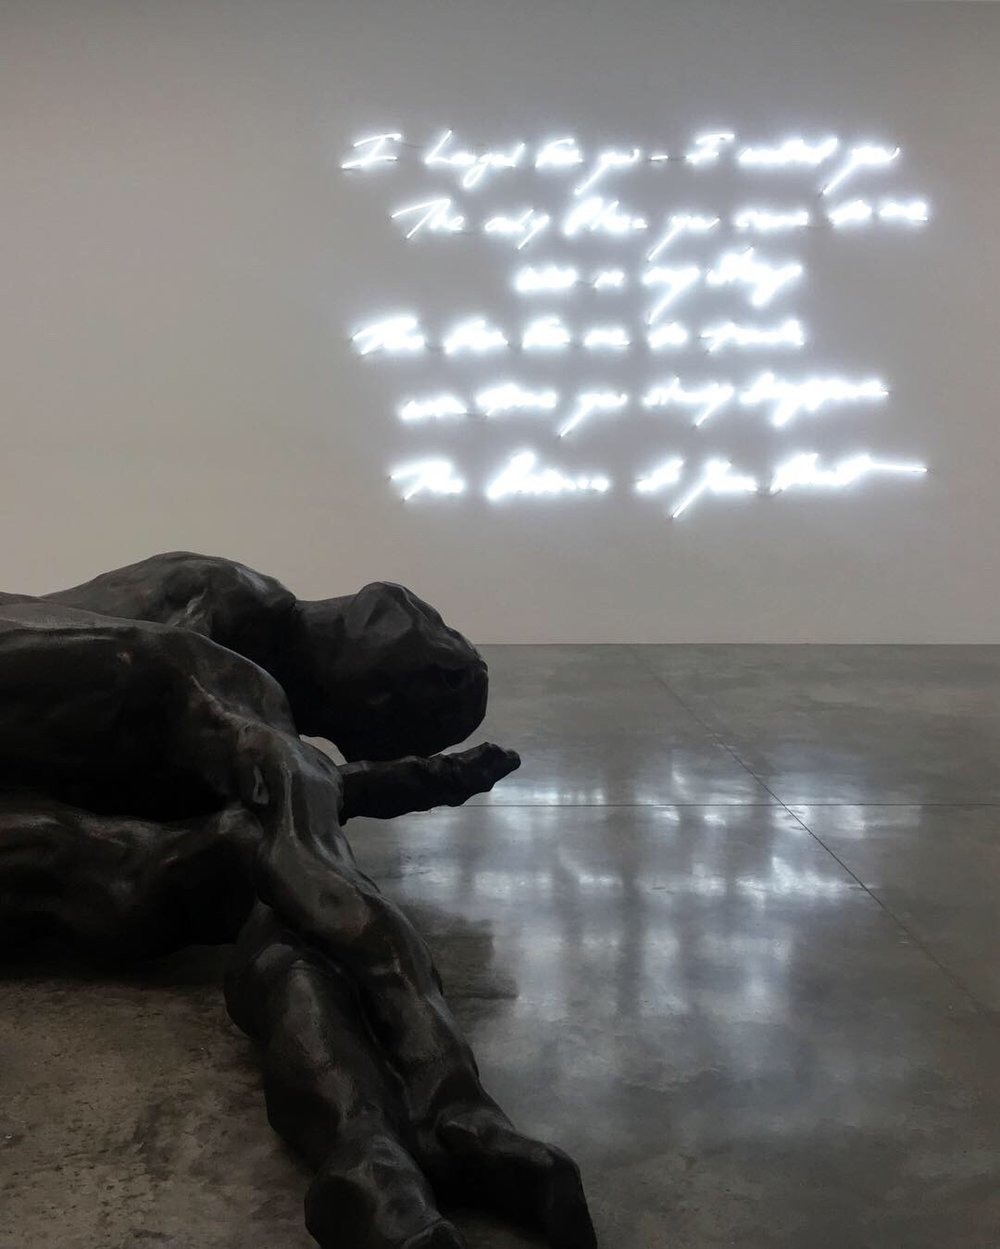 Tracey Emin - When I Sleep & I Longed For You